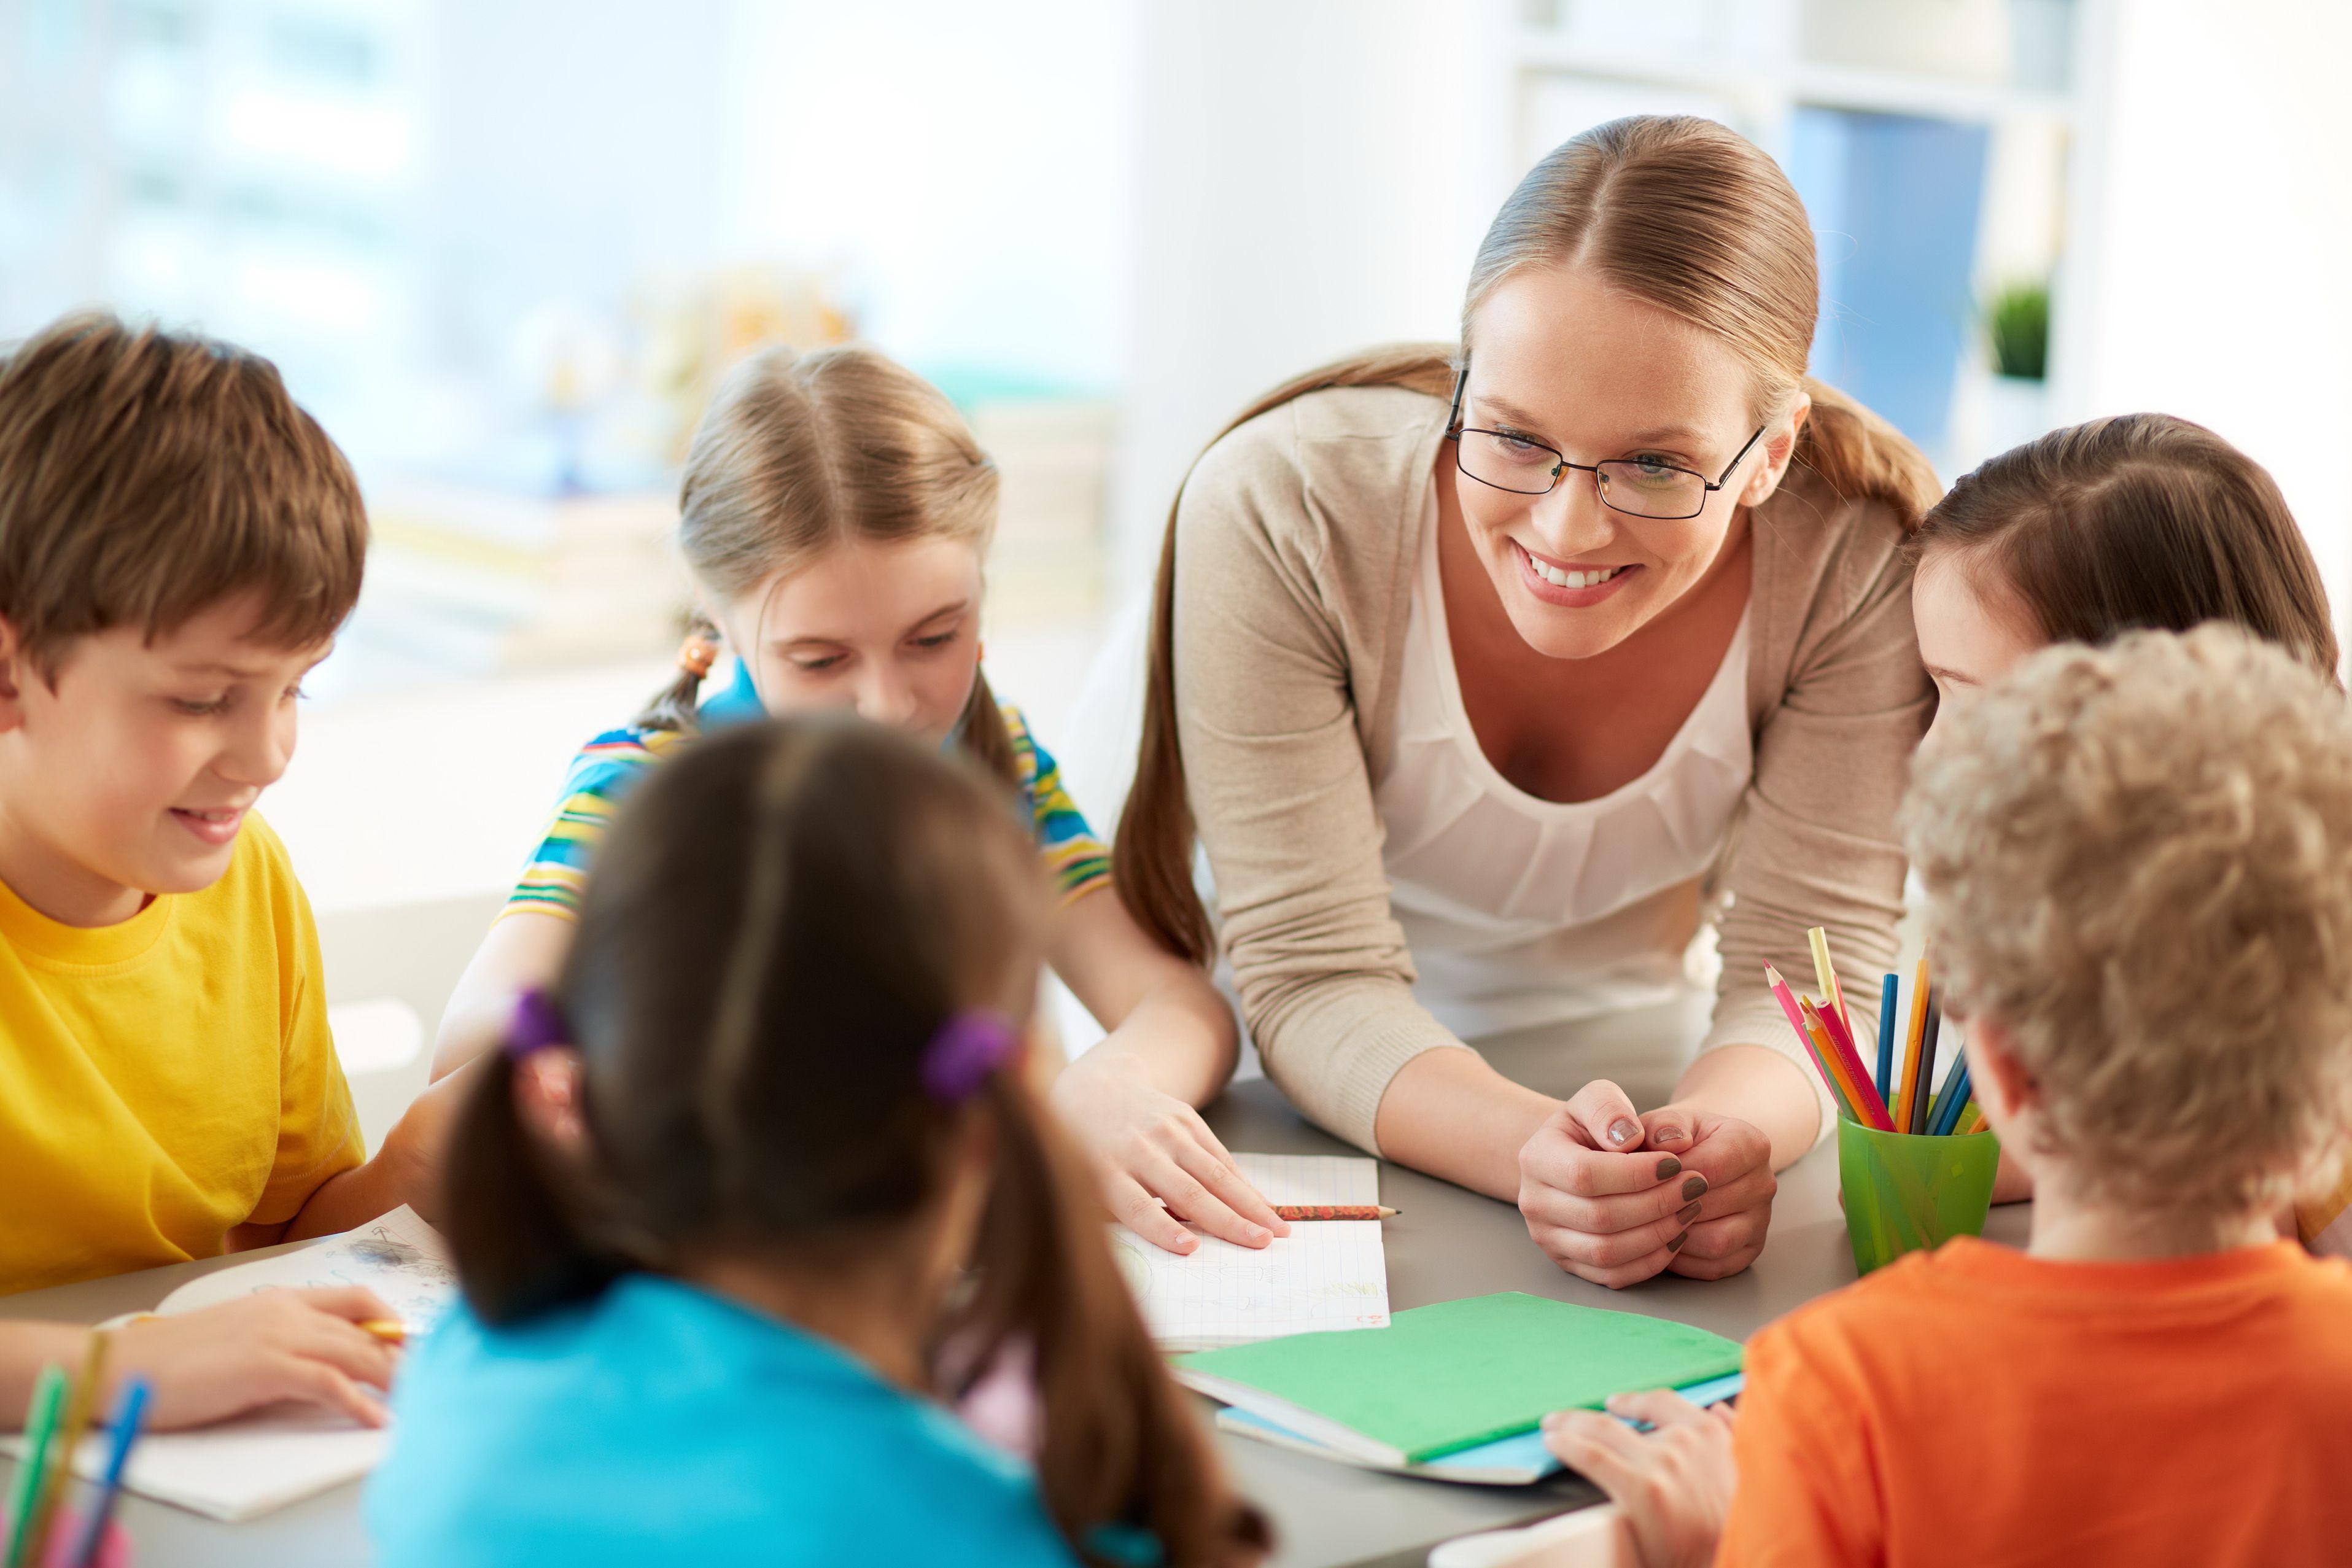 teacher assistant development of the child